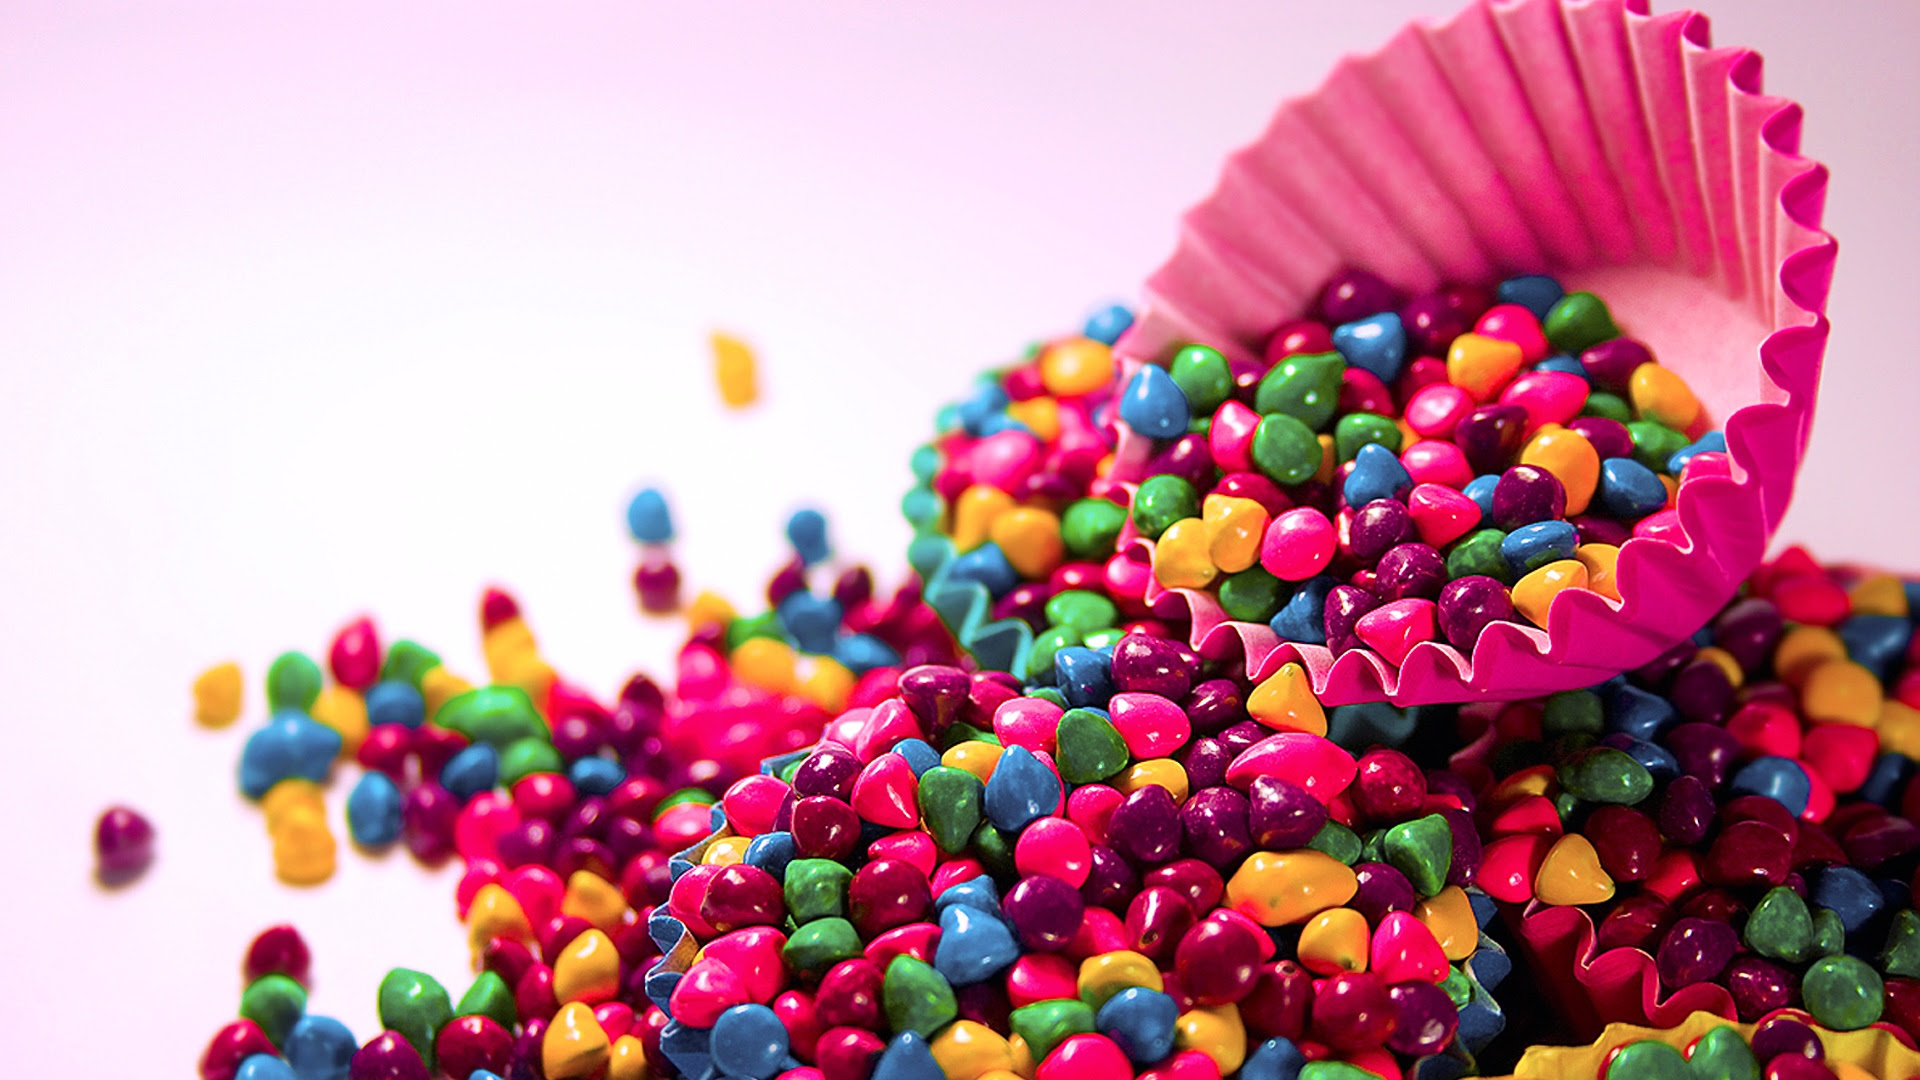 ColorFull Choclate Ball [1920x1080]